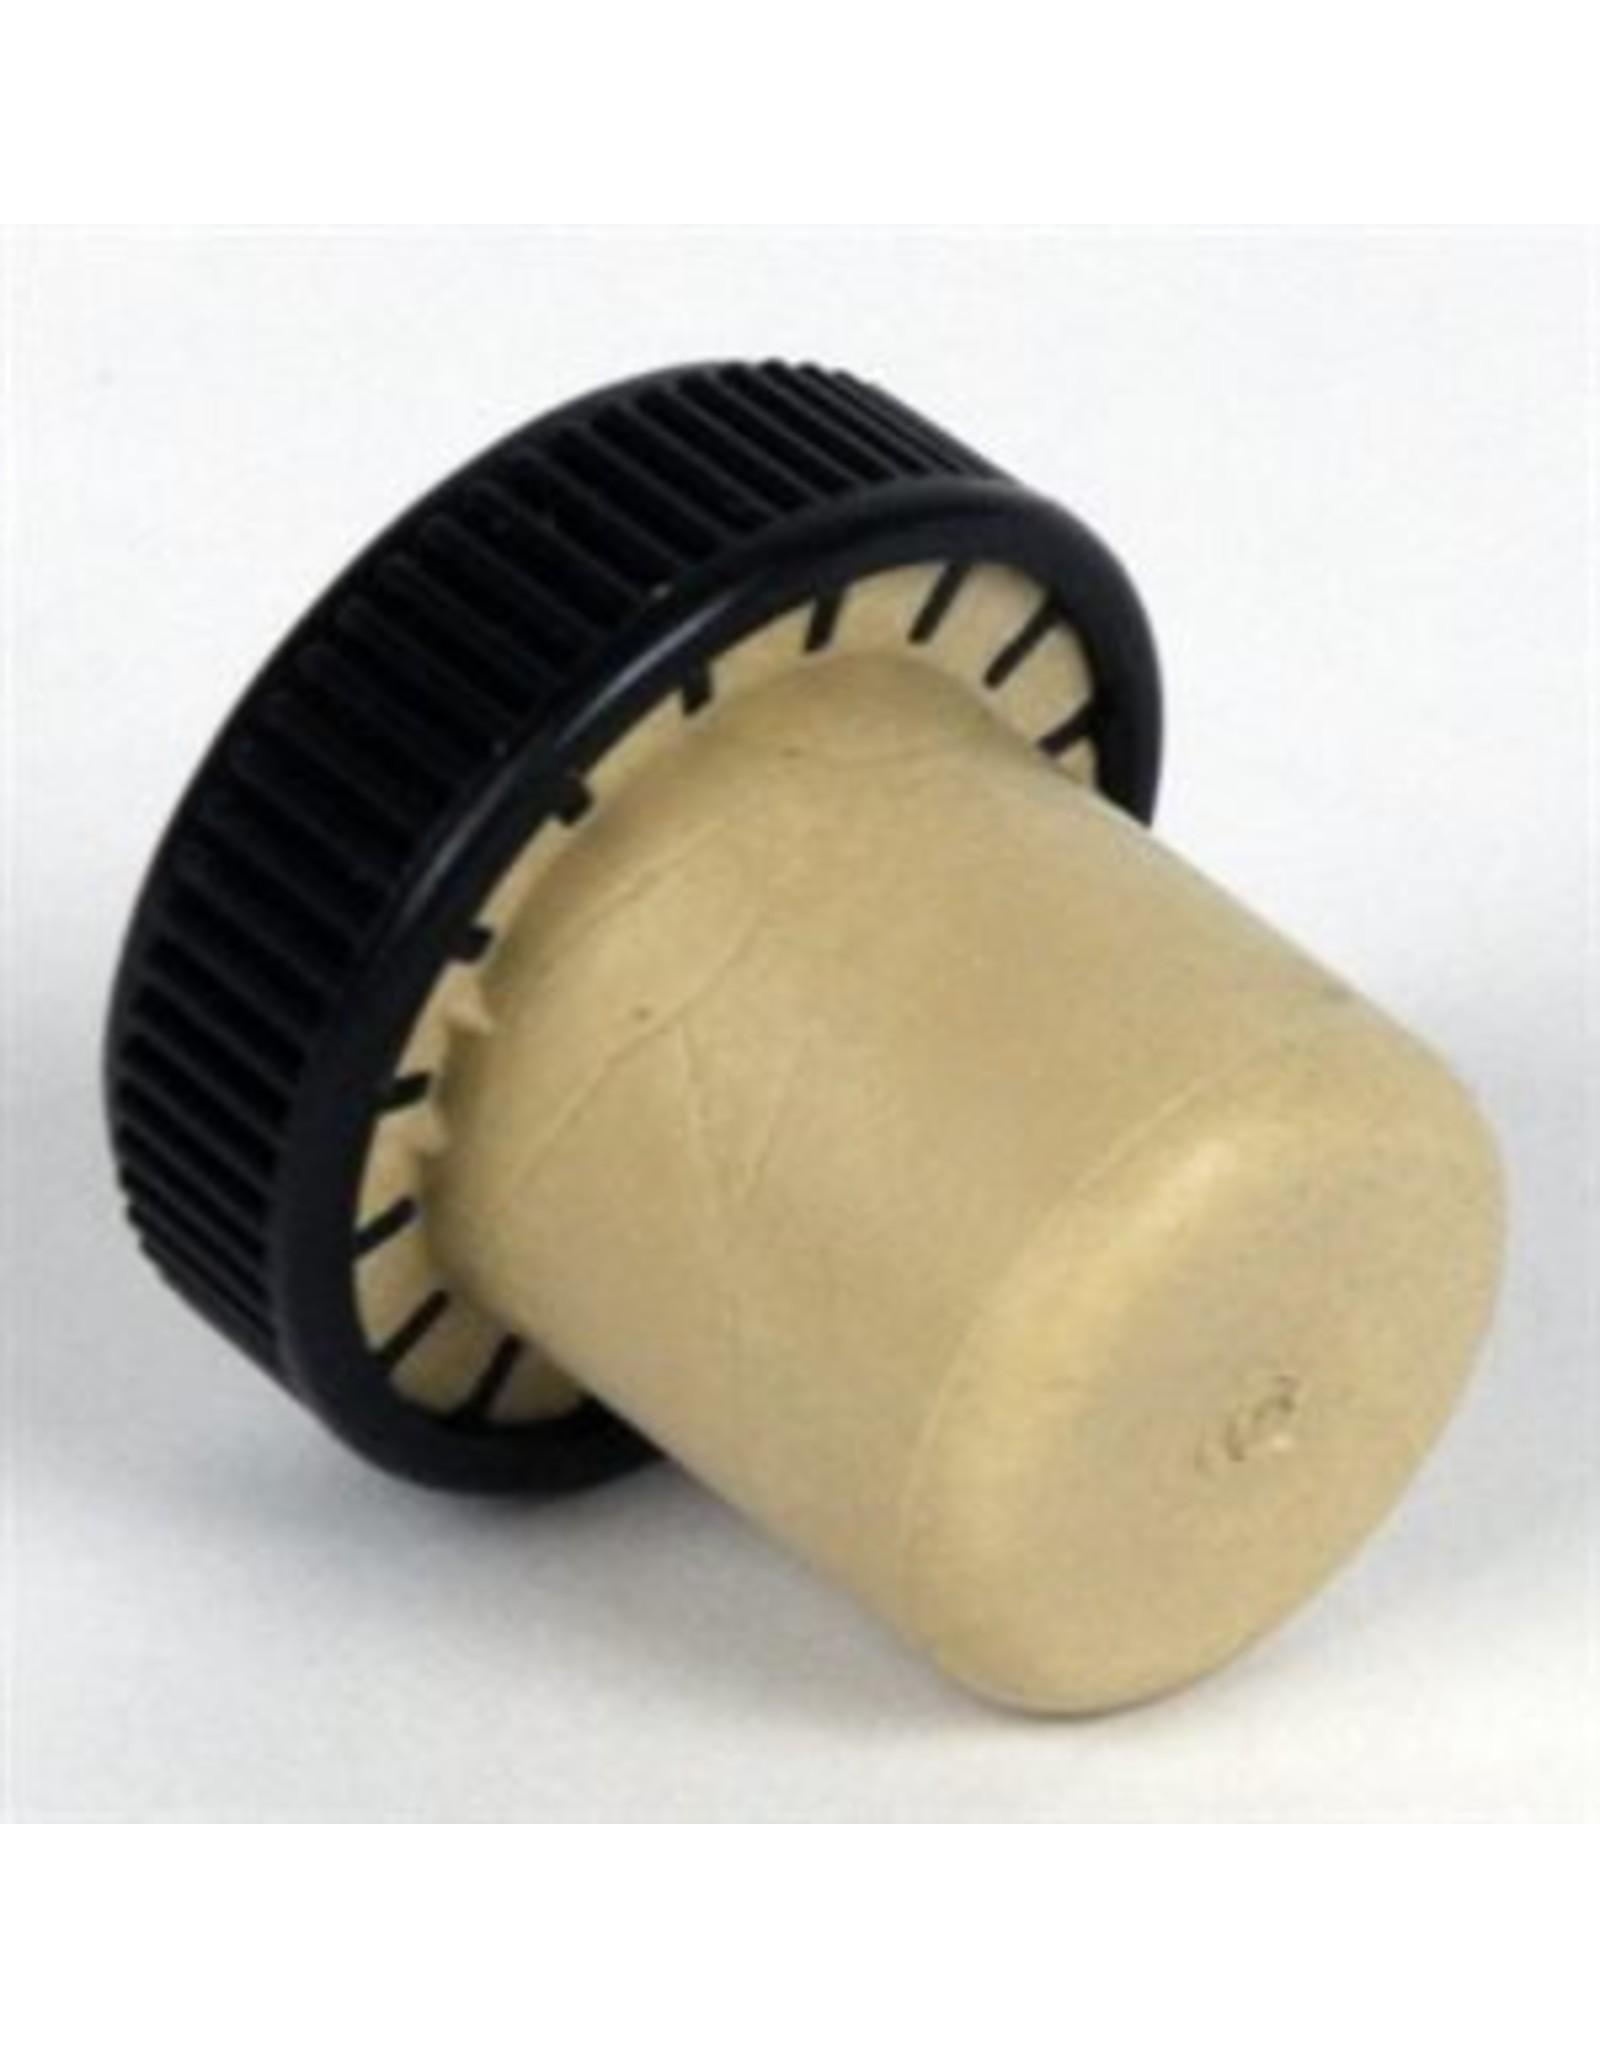 T Cork, Synthetic Stopper. 21.5mm - Spirit Bottle Single